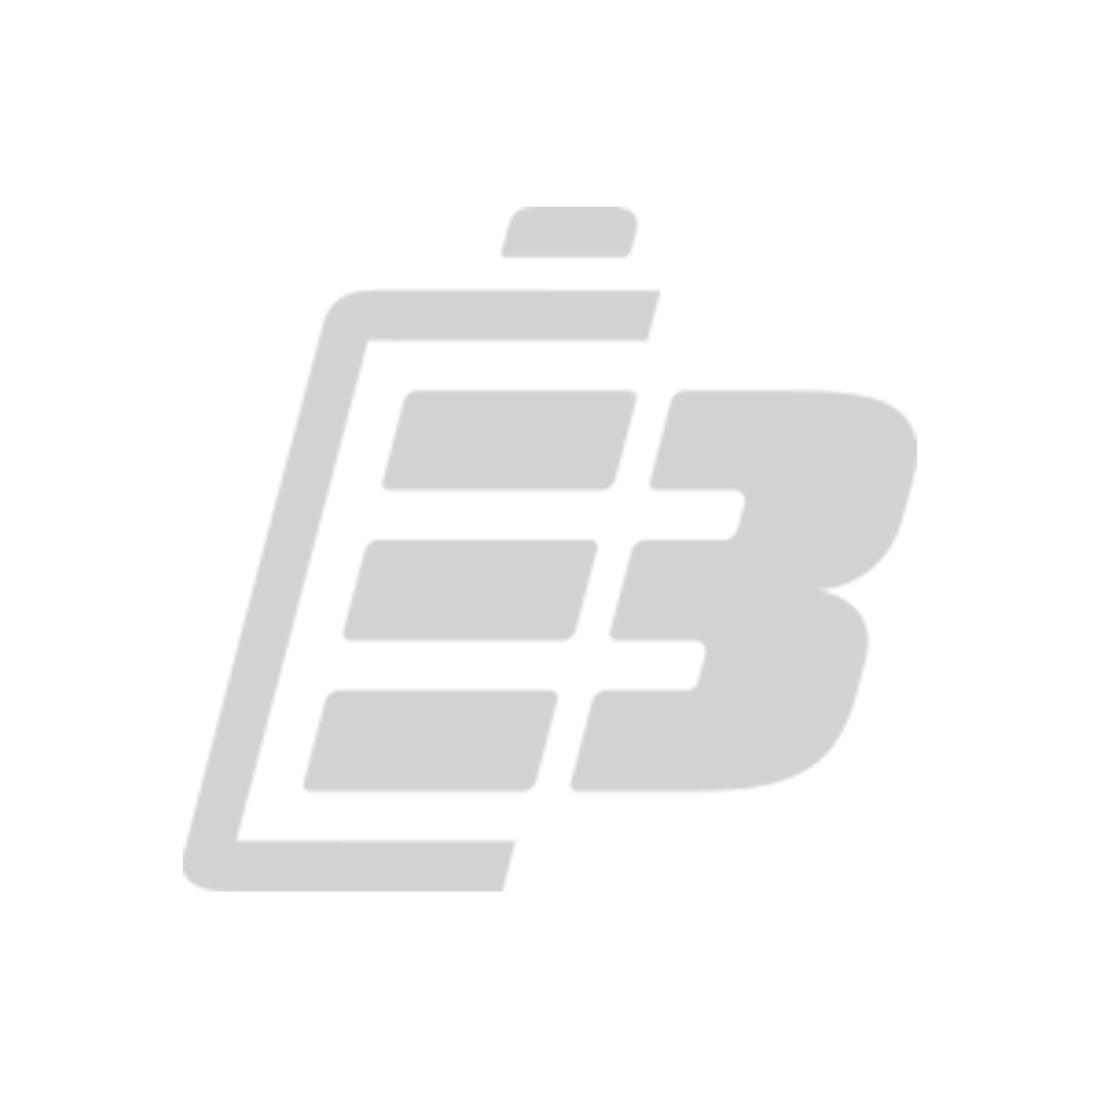 MP3 battery Apple iPod Nano 3rd generation_1